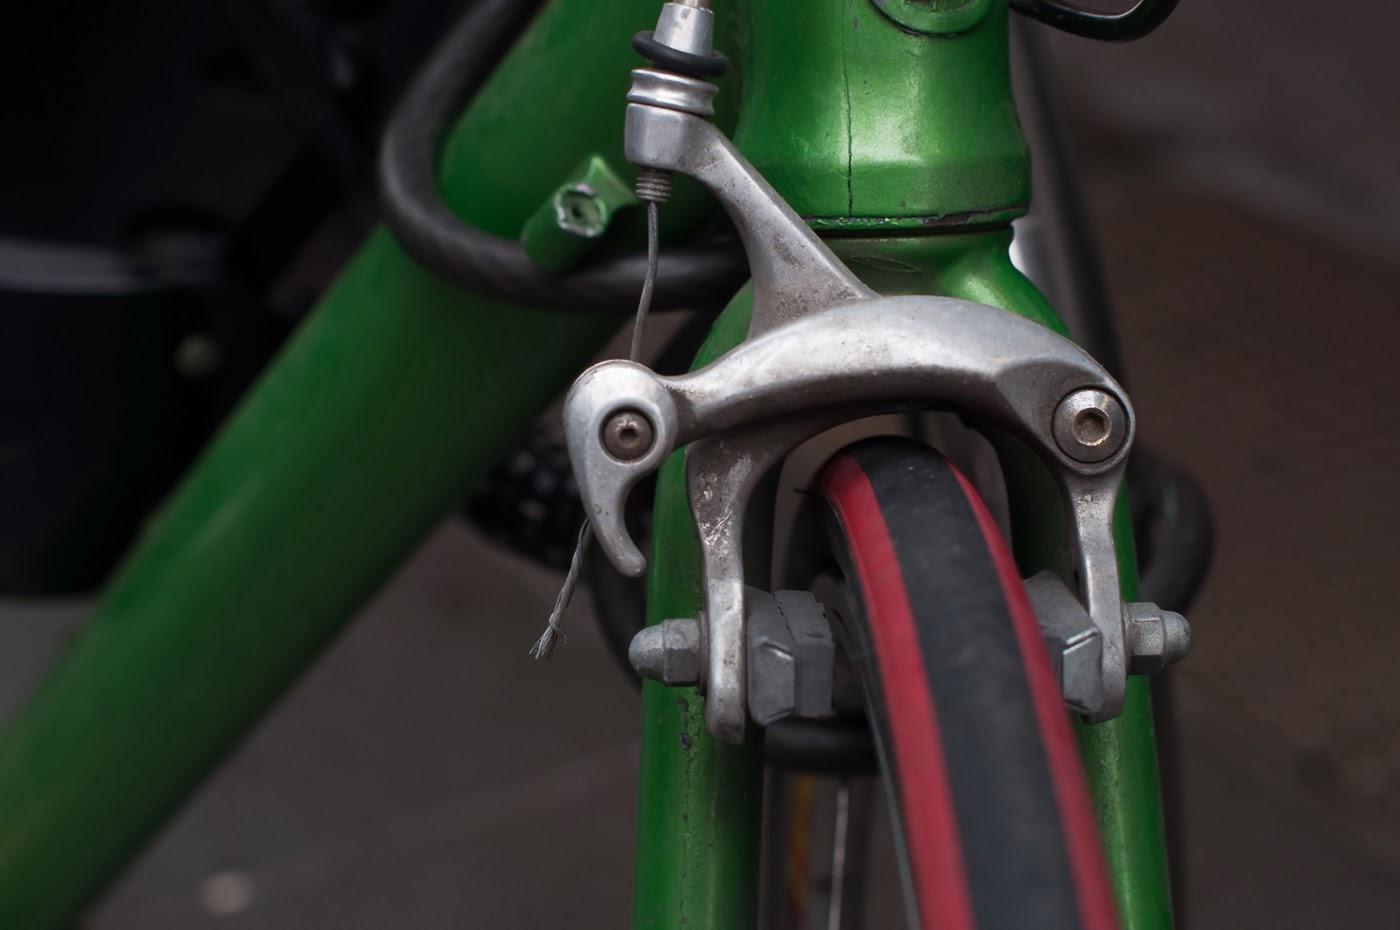 single speed, bike, bicycle, tim macauley, the biketorialist, melbourne, conversion, chain, tensioner road bik, front, brake